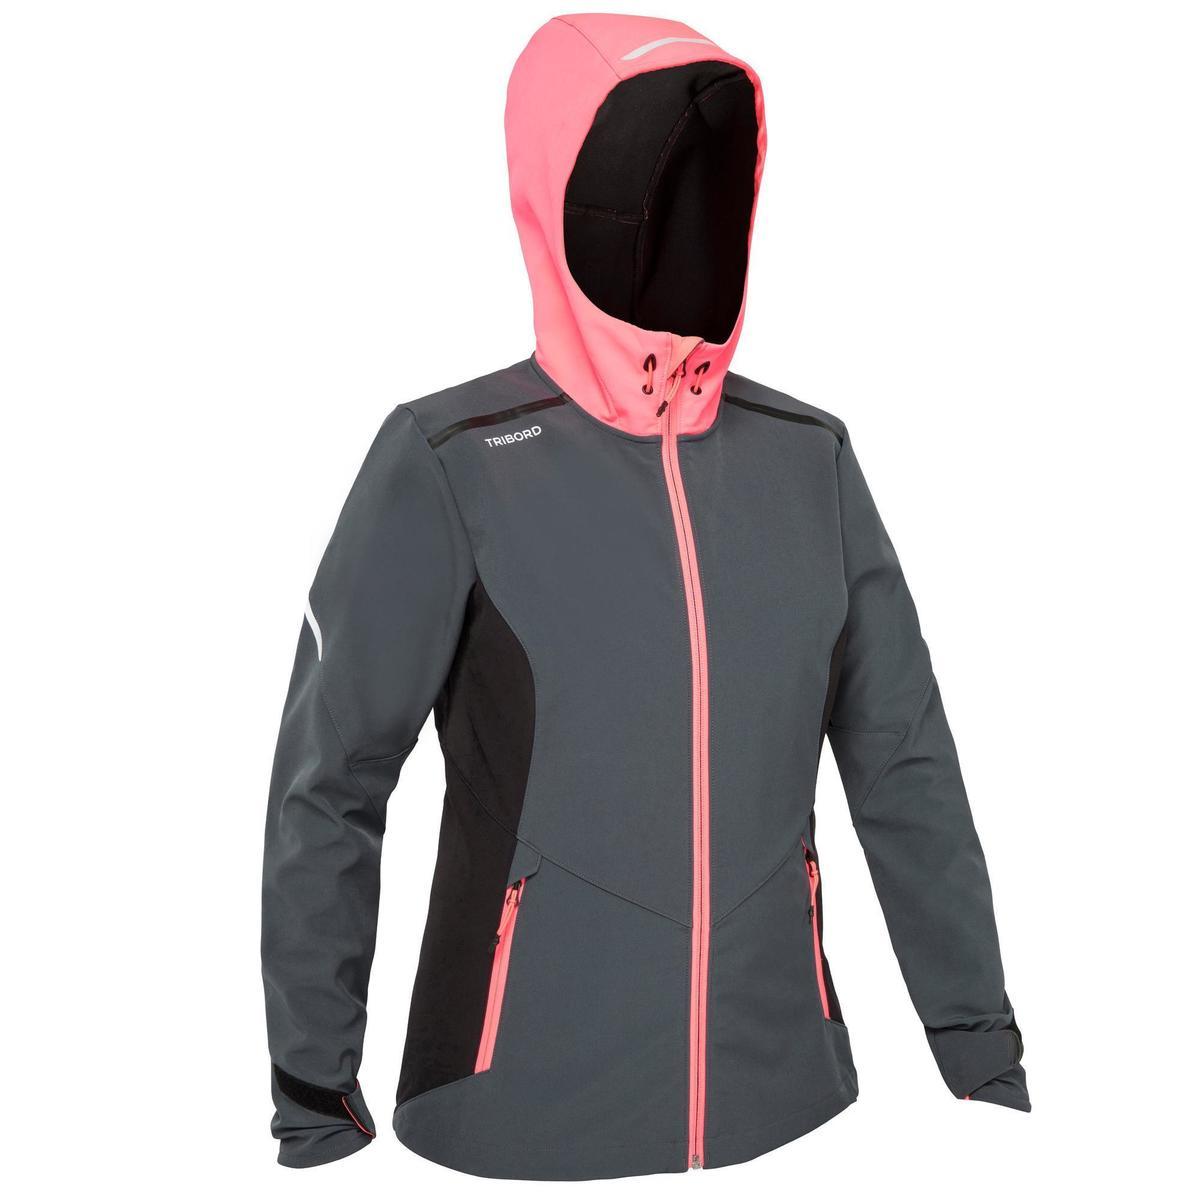 Bild 1 von Softshelljacke Segeln Race Damen grau/neonrosa